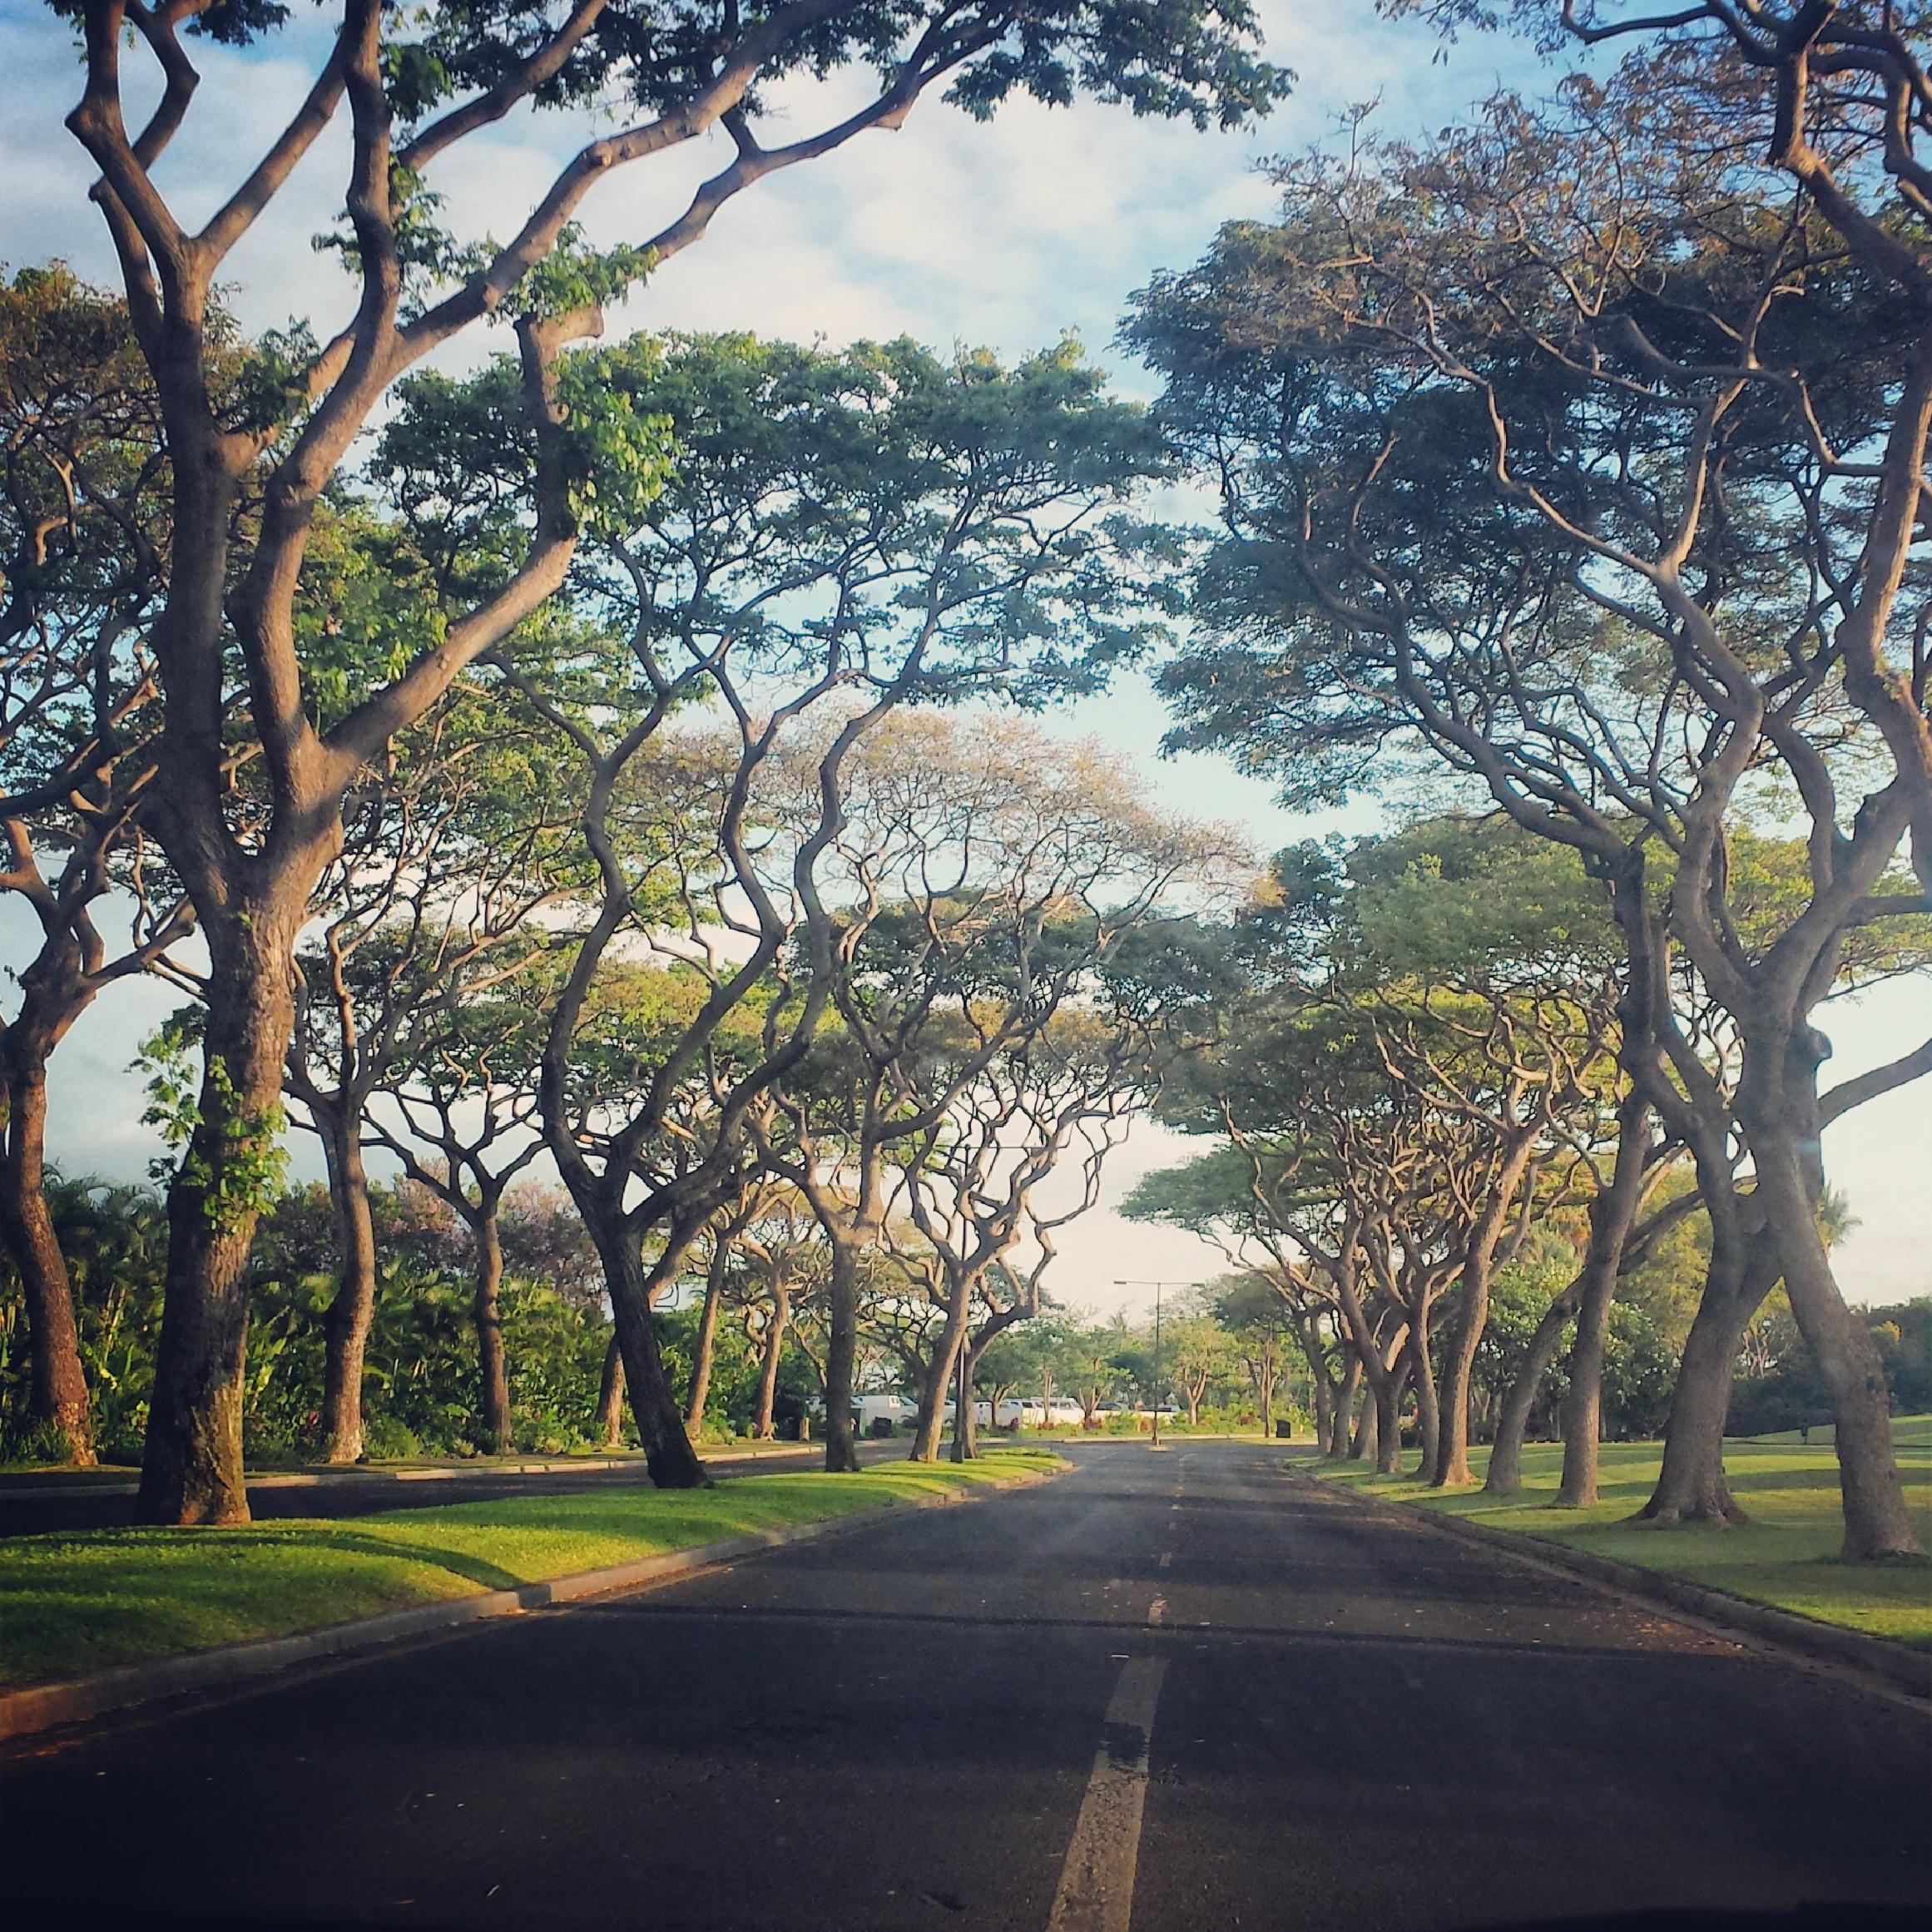 wailea-tree-lined-road